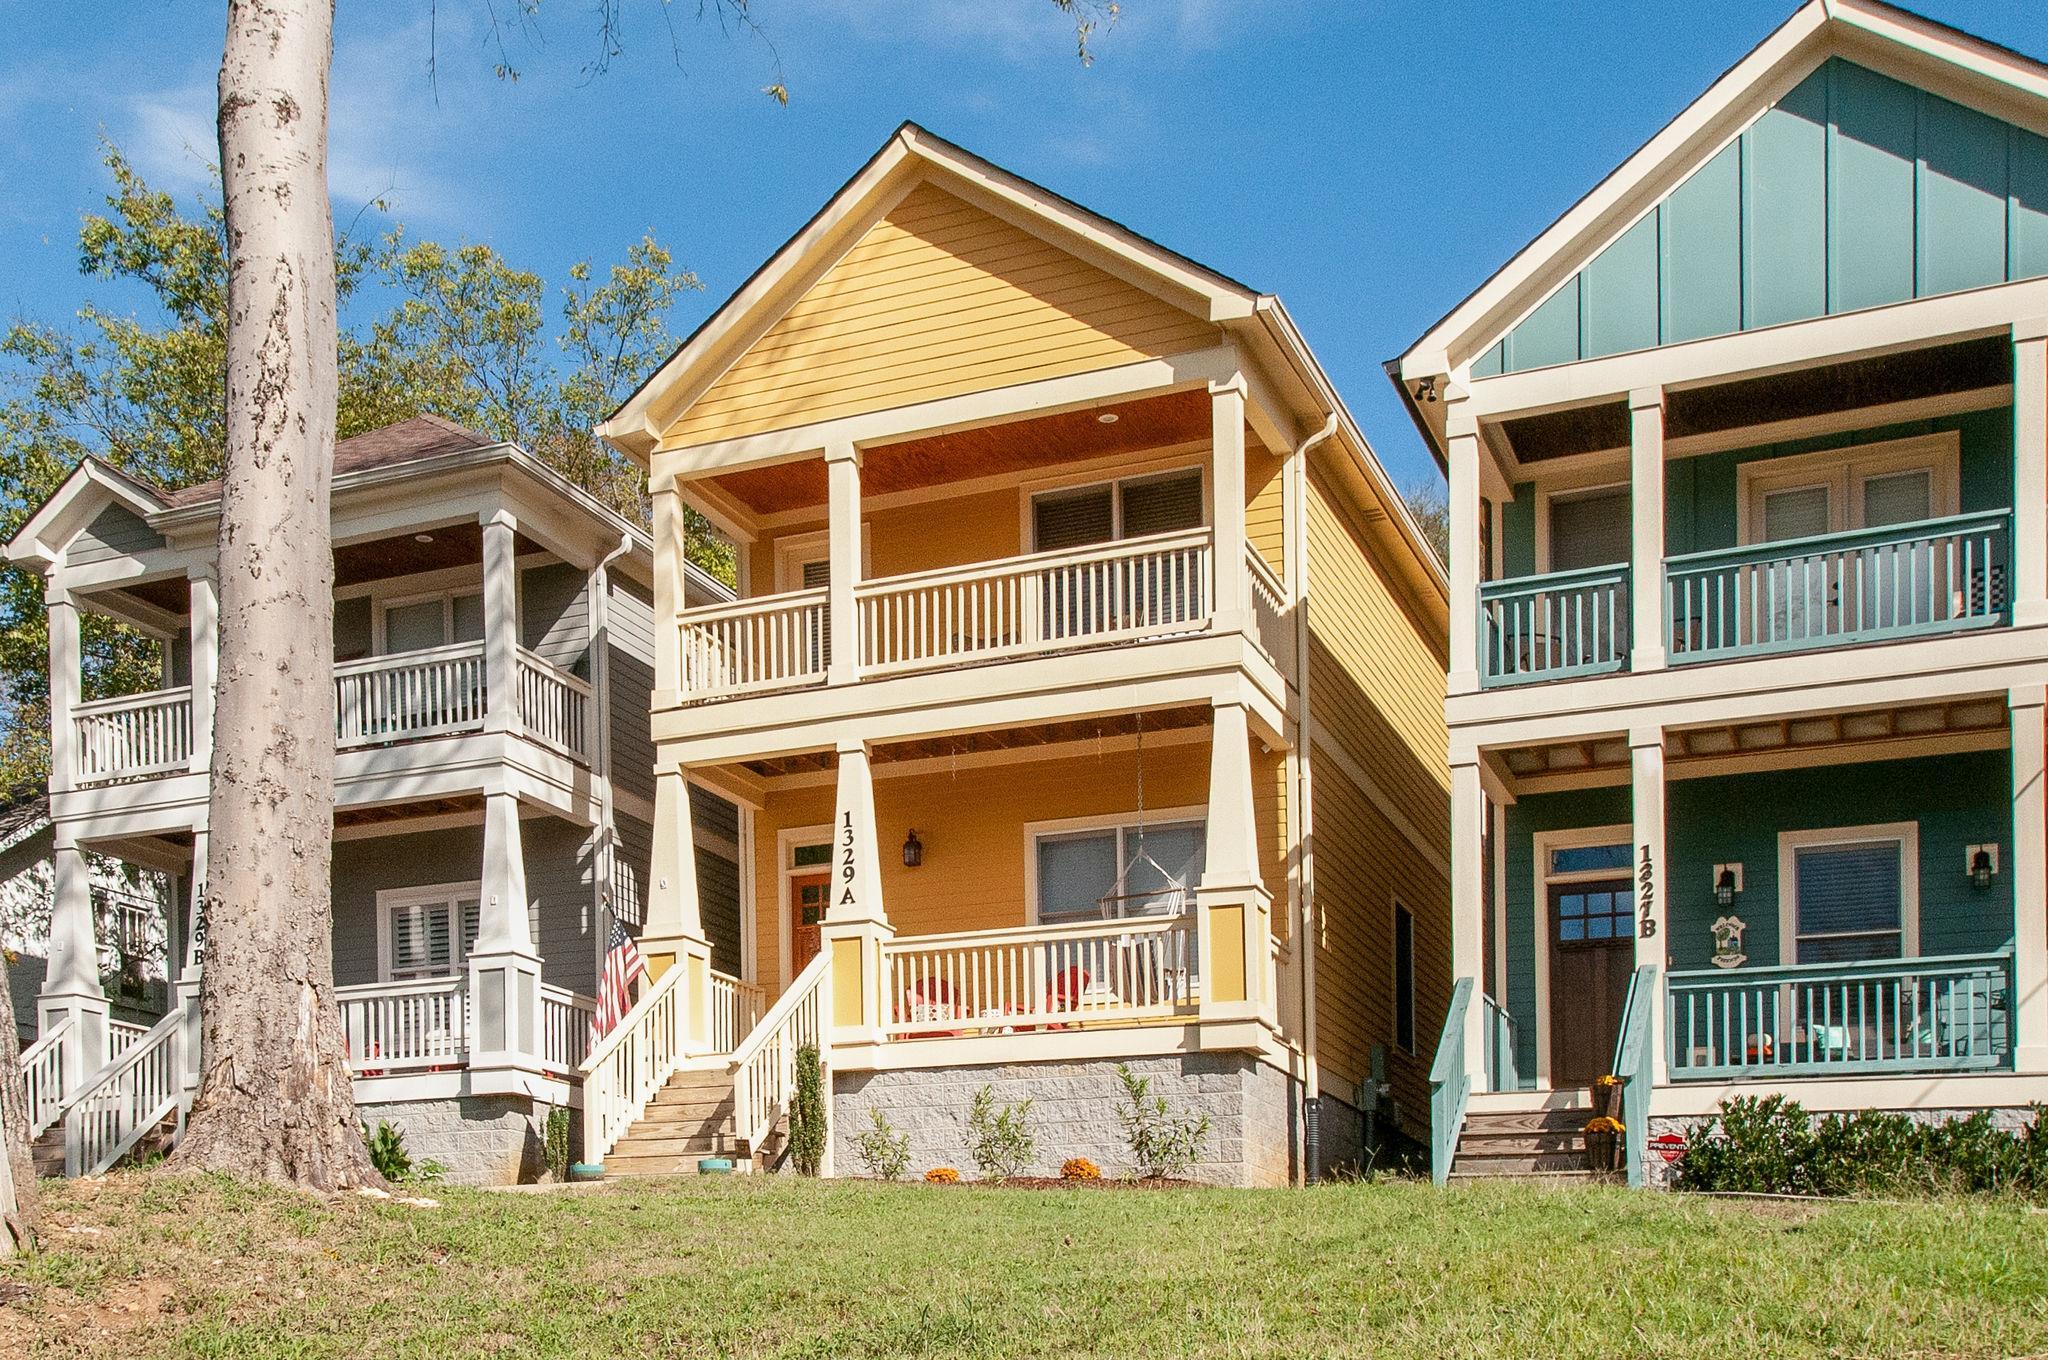 1329A Meridian St, Nashville, TN 37207 - Nashville, TN real estate listing